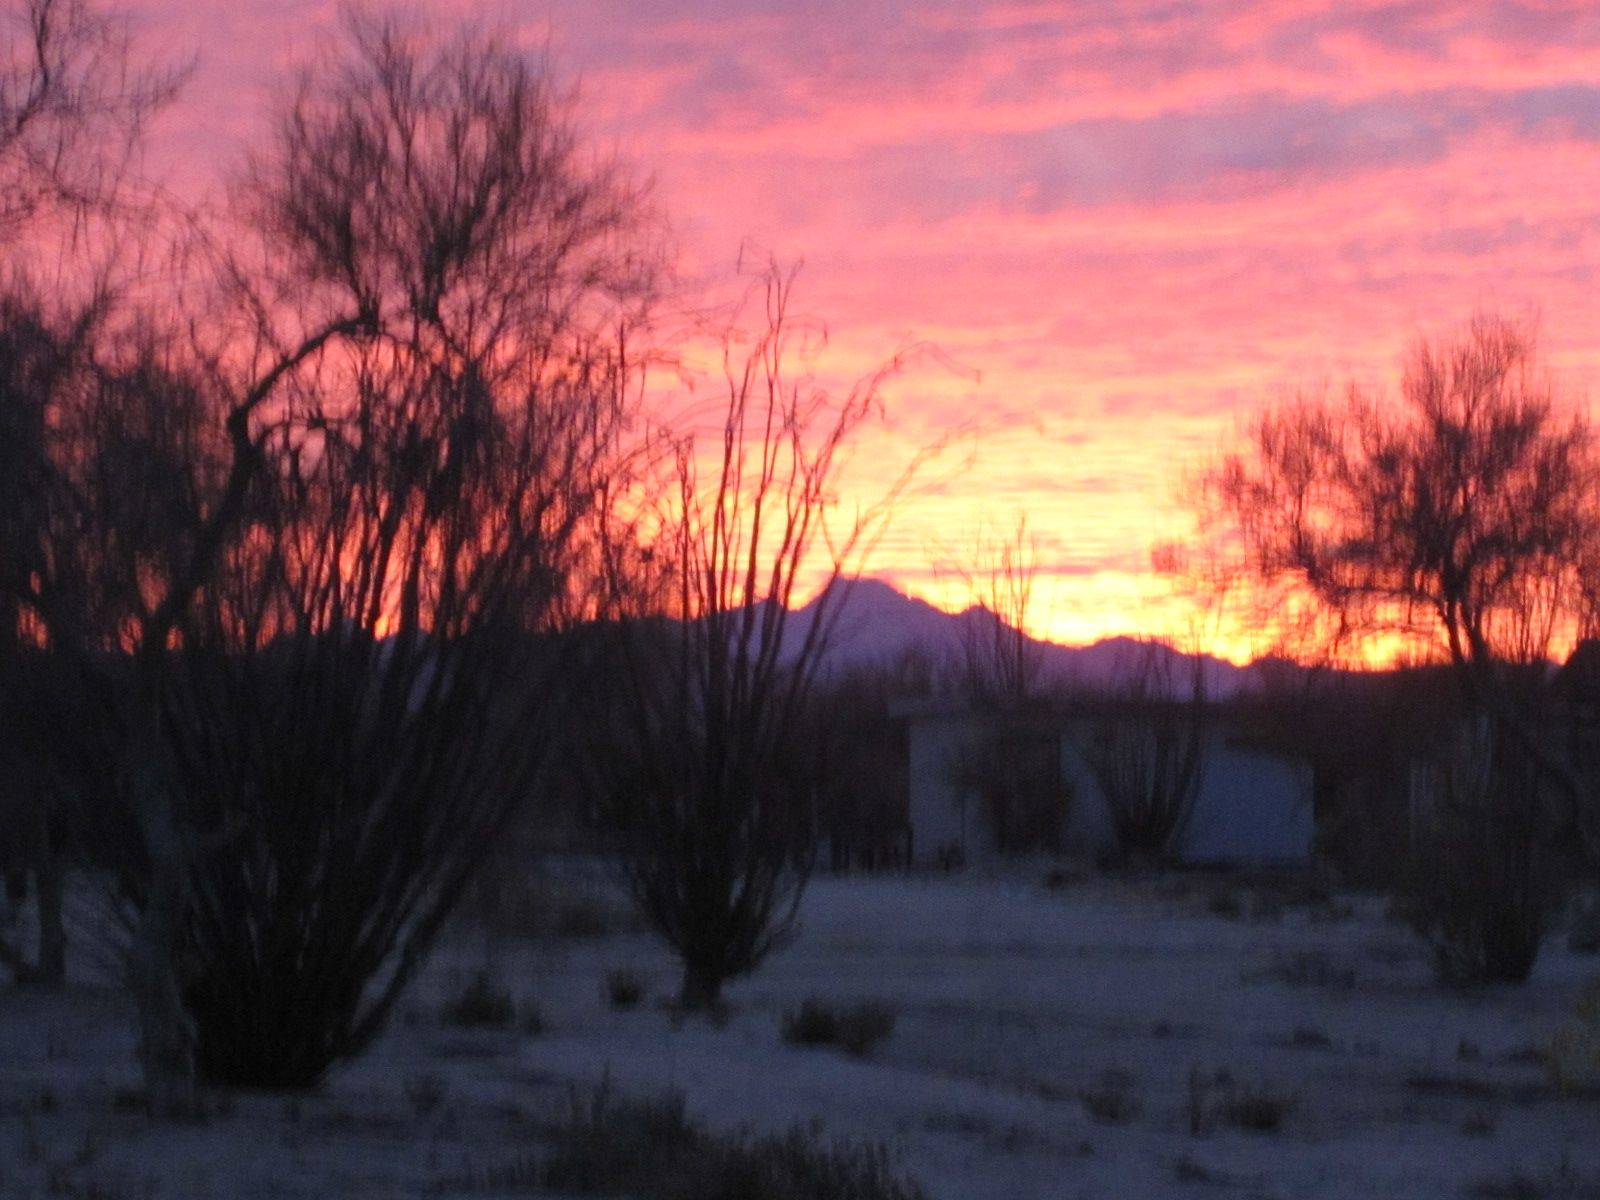 Sunset over Diablo Mountains